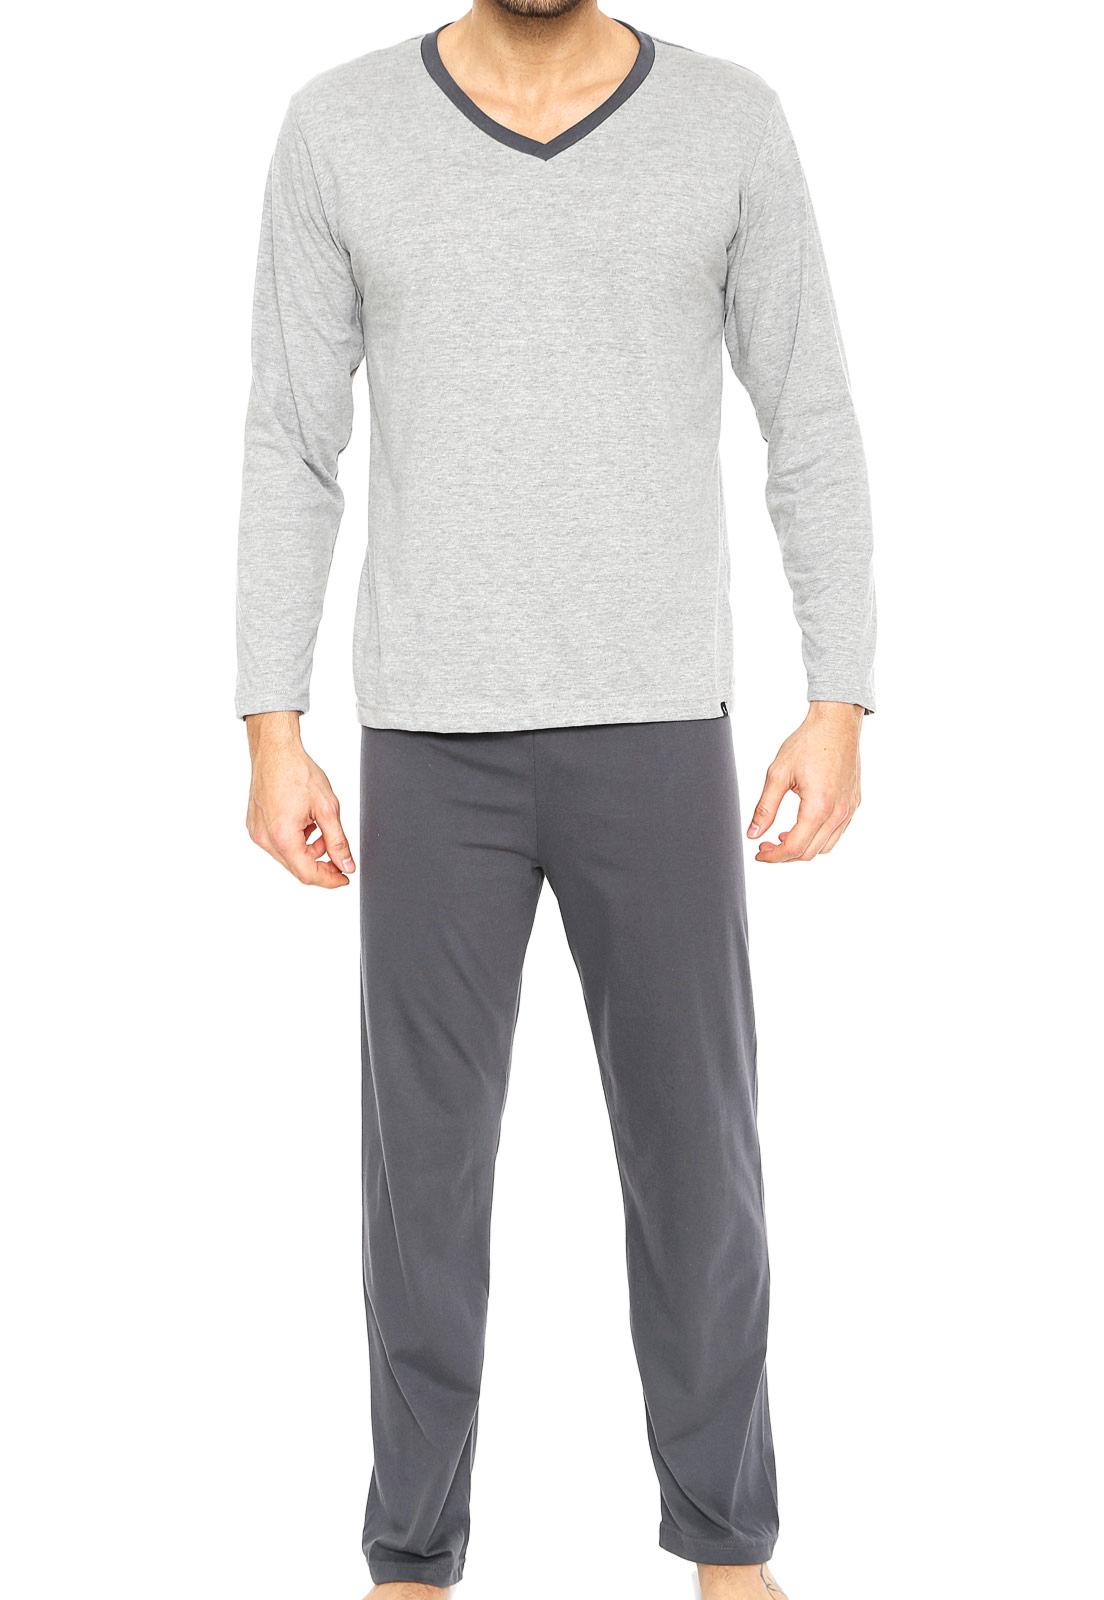 Pijama Masculino Adulto Lupo Manga Longa com Calça Cinza em Algodão 28011